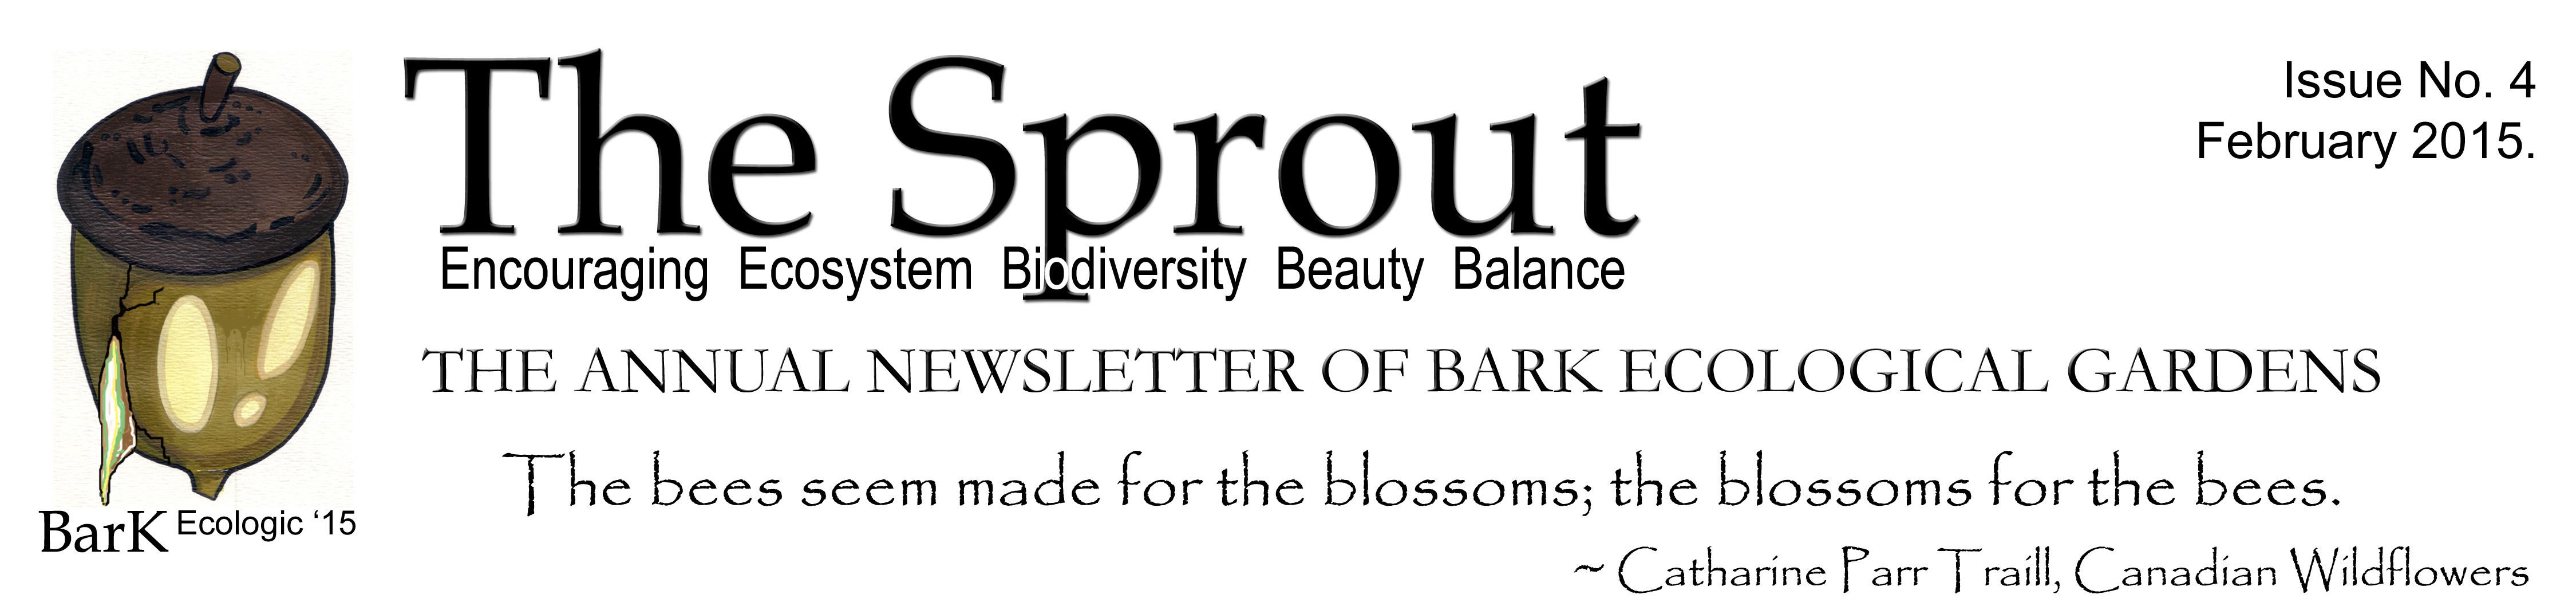 Sprout Letterhead 2015.jpg